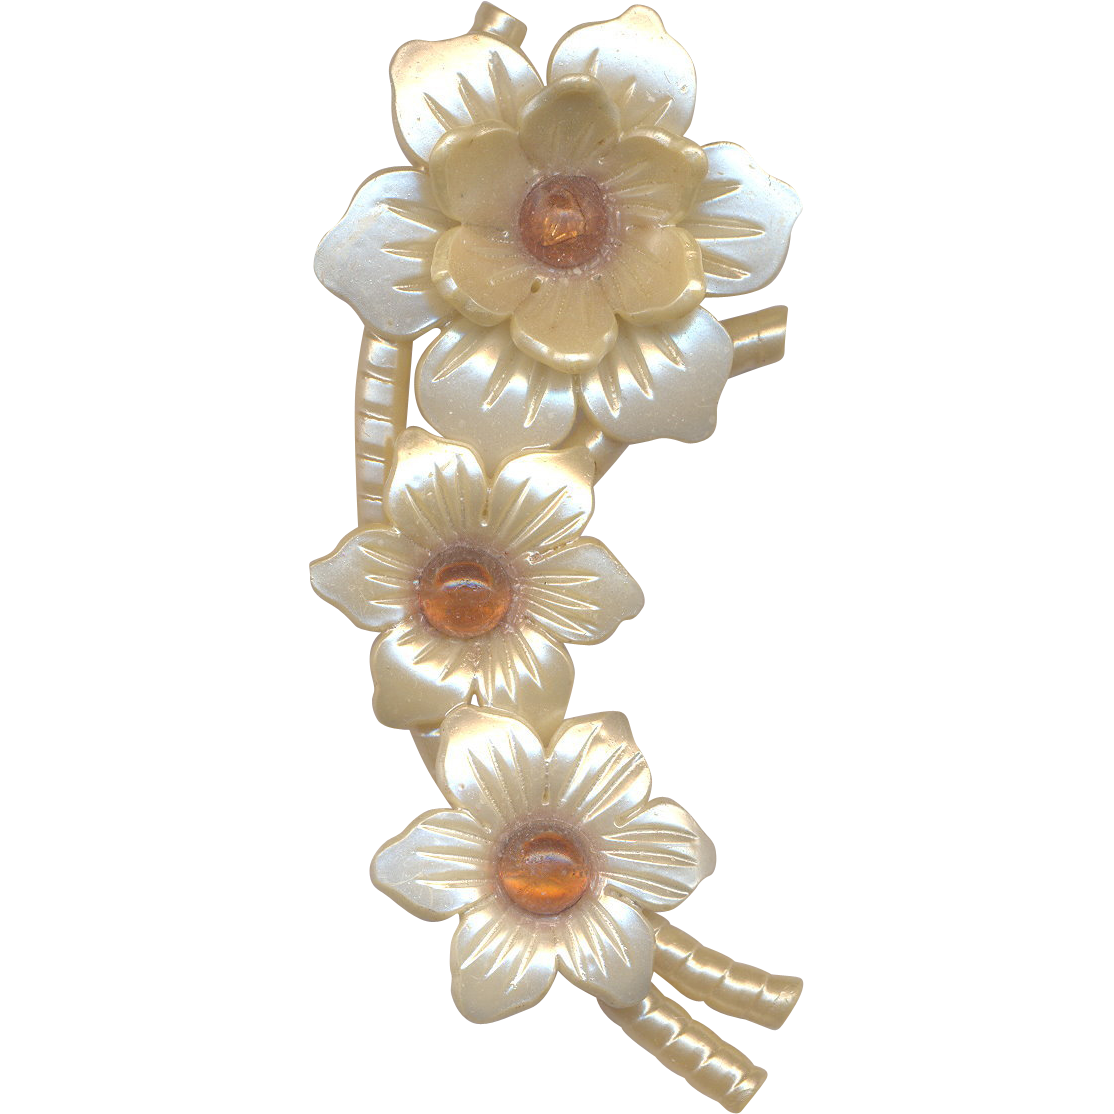 Vintage Nylon Flower Brooch